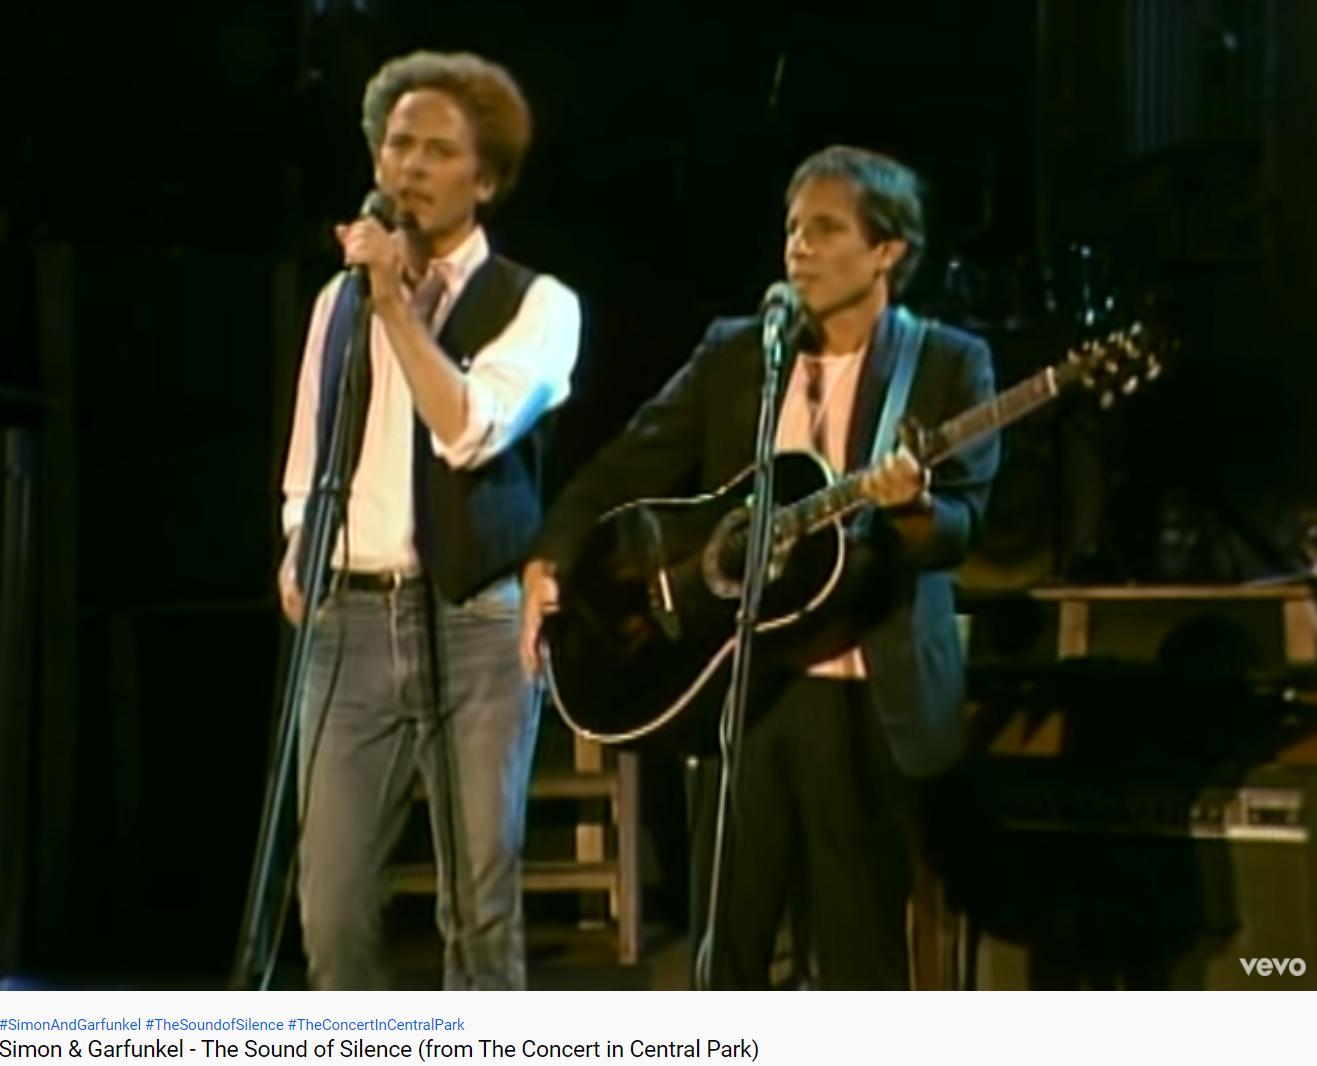 Simon & Garfunkel The Sound of silence